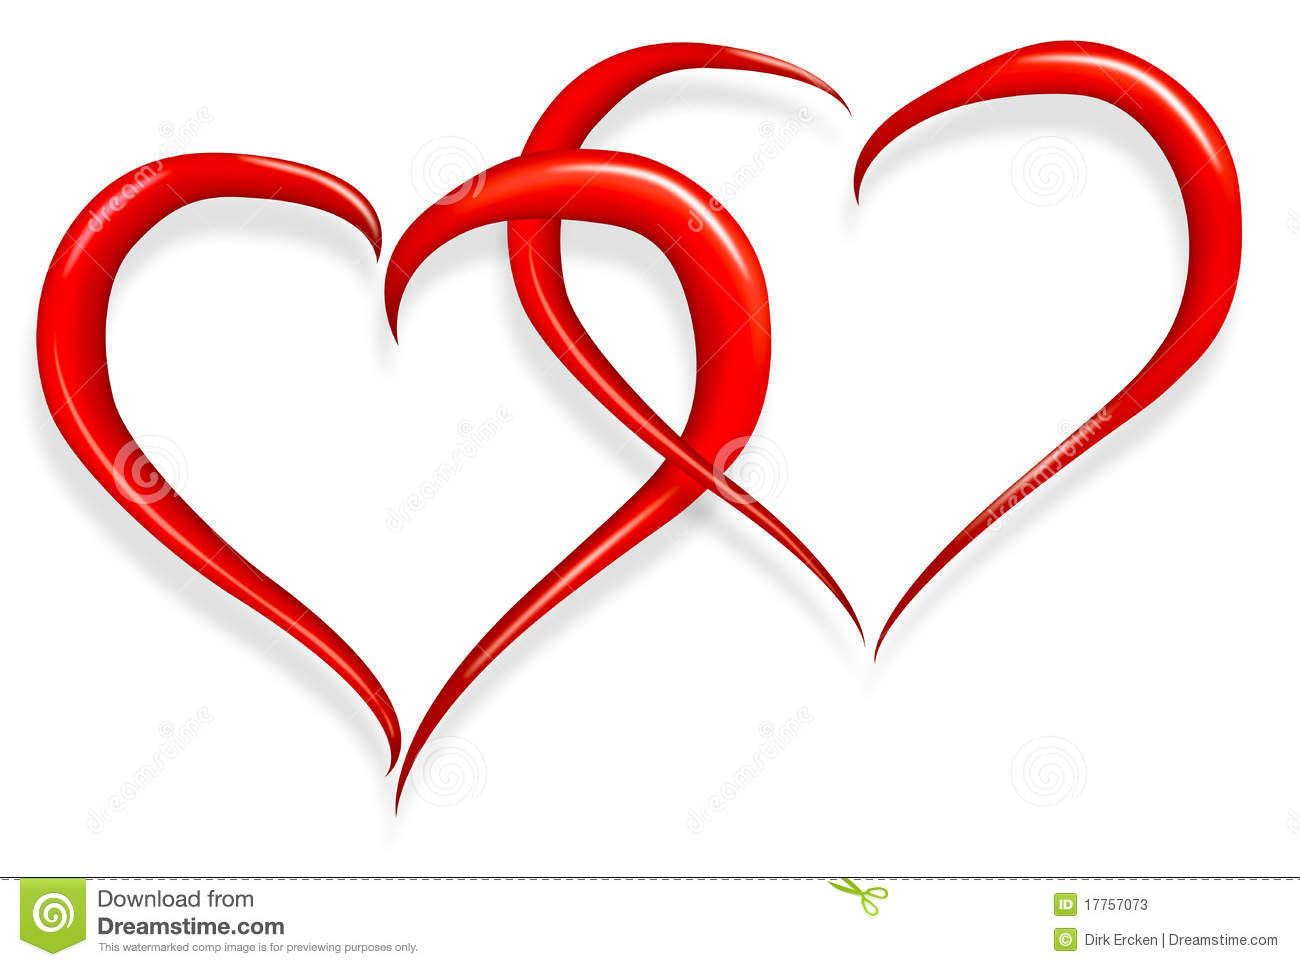 love hearts images free download best love hearts images on. Black Bedroom Furniture Sets. Home Design Ideas